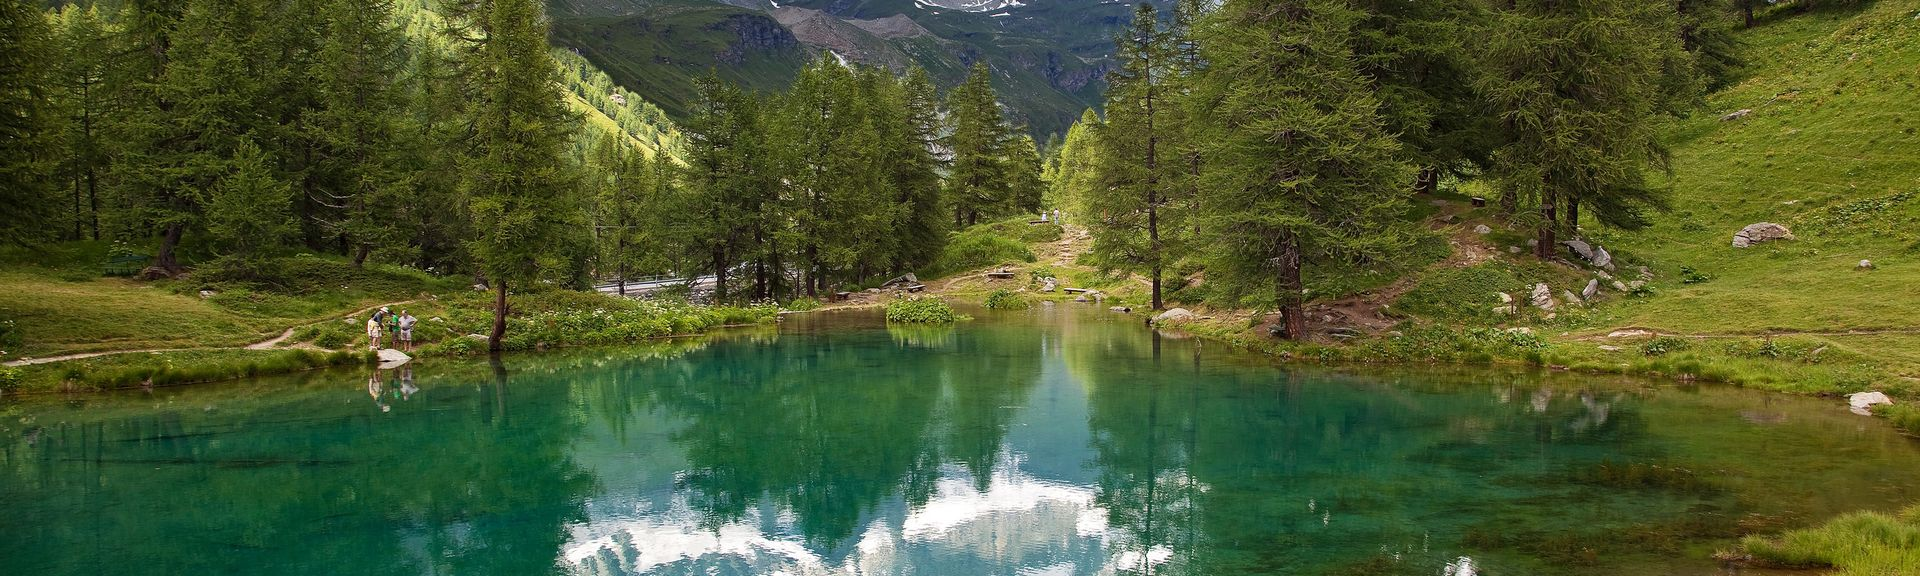 Cervinia, Valle d'Aosta, Italië